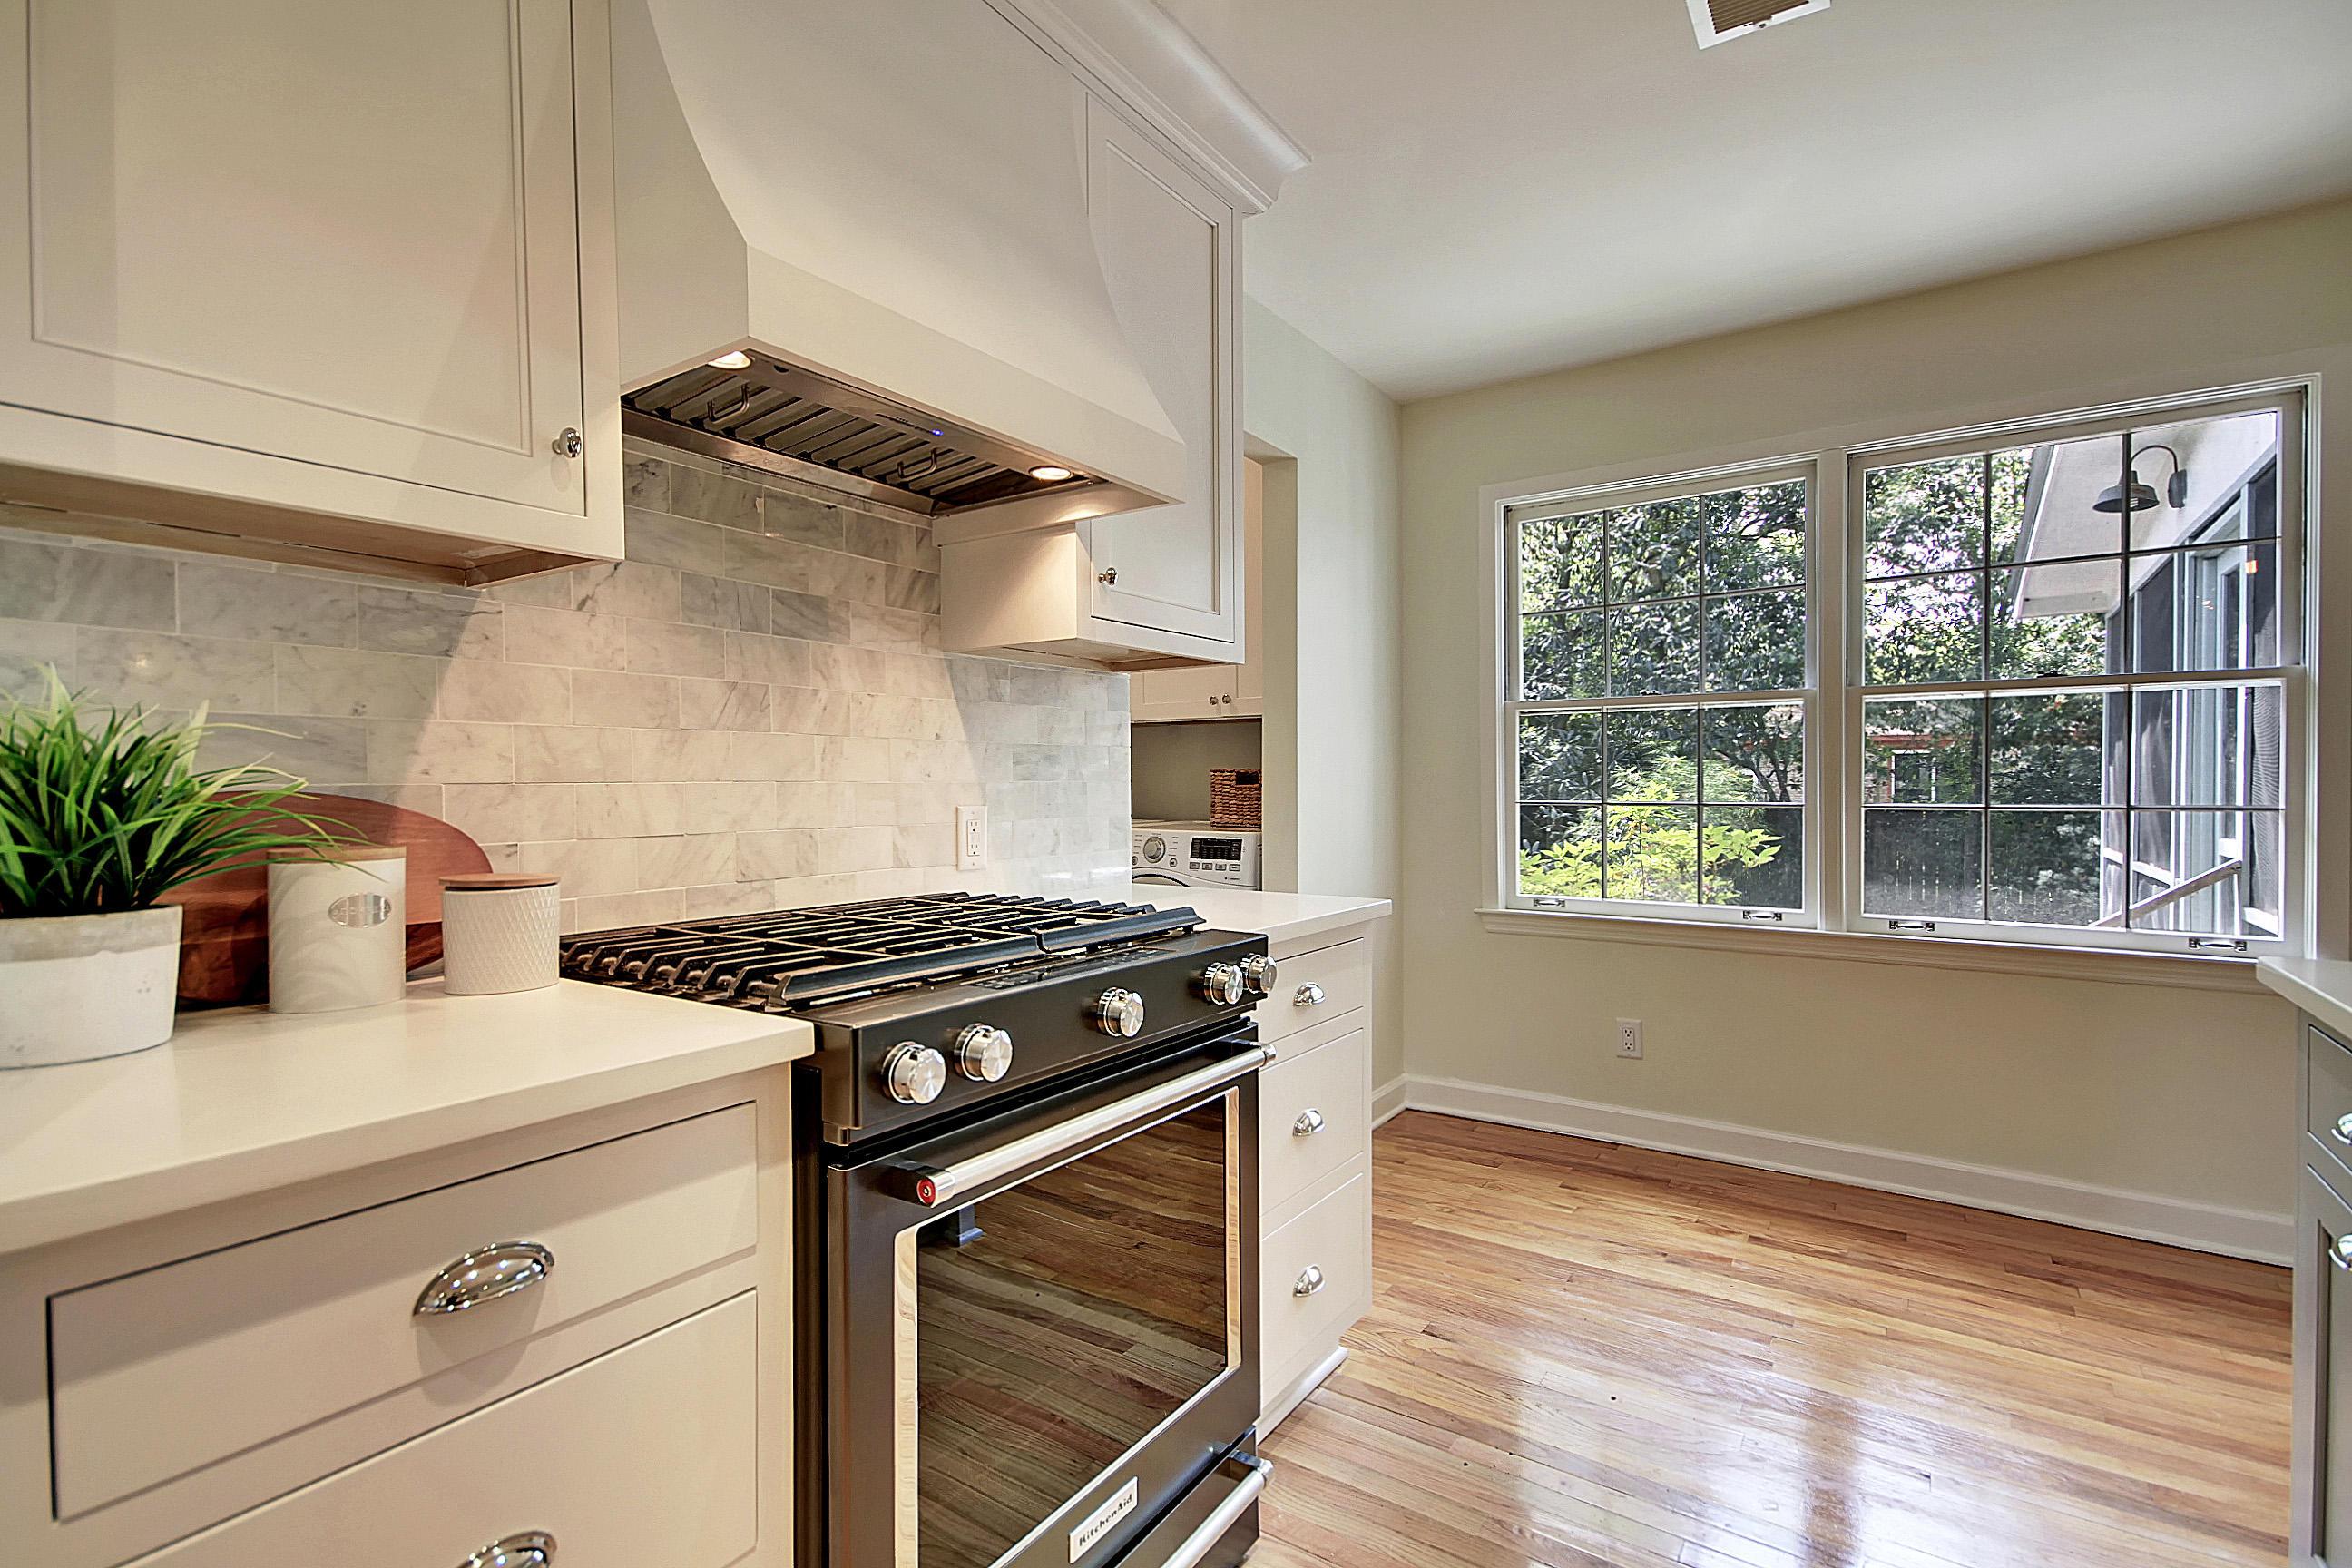 Old Mt Pleasant Homes For Sale - 1466 Glencoe, Mount Pleasant, SC - 27